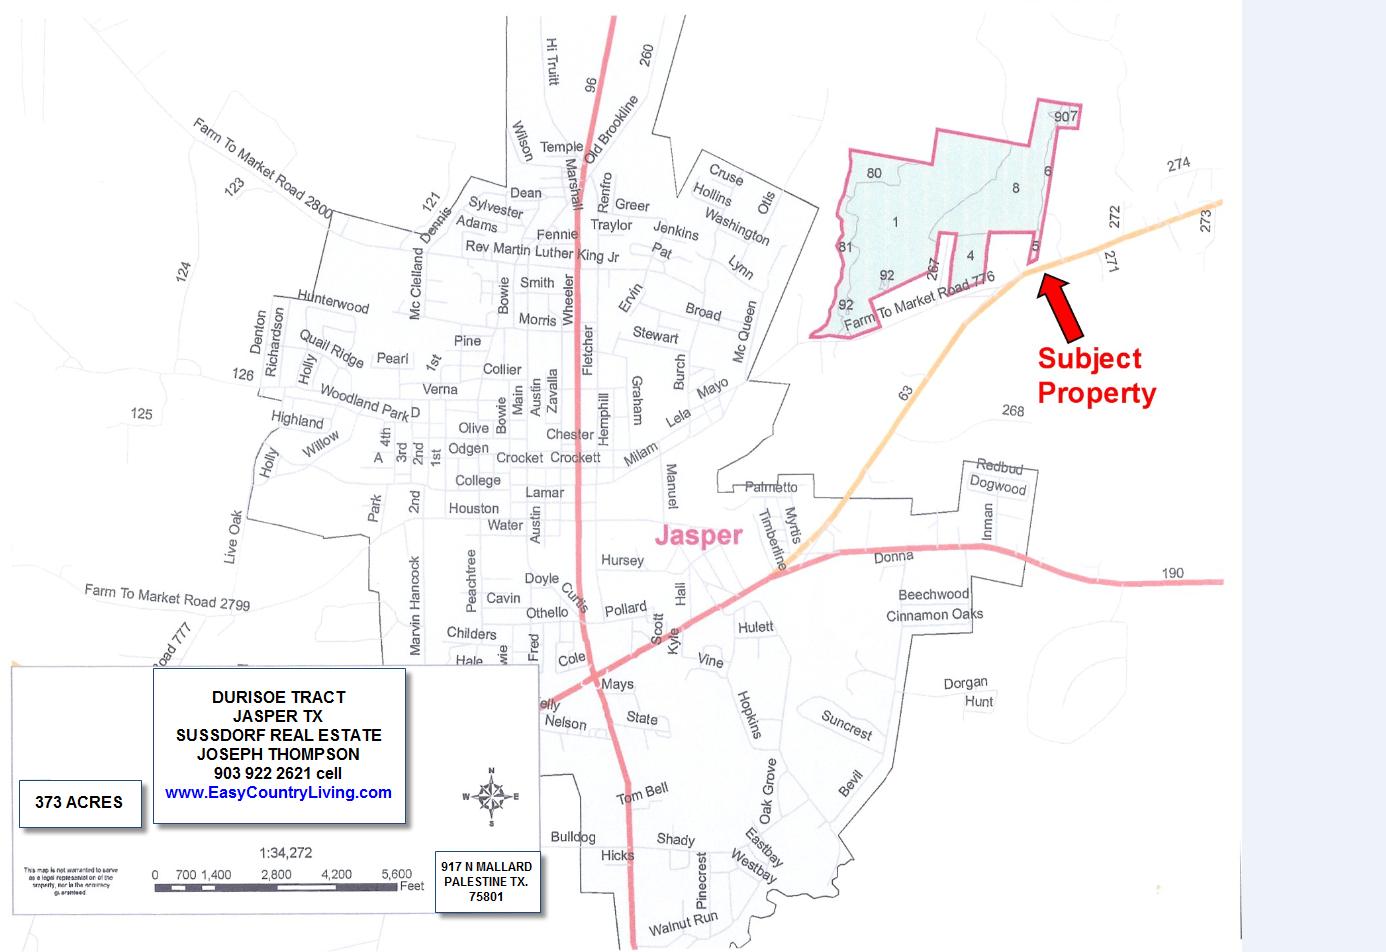 21 Acres In Jasper County, Texas - Jasper County Texas Parcel Map